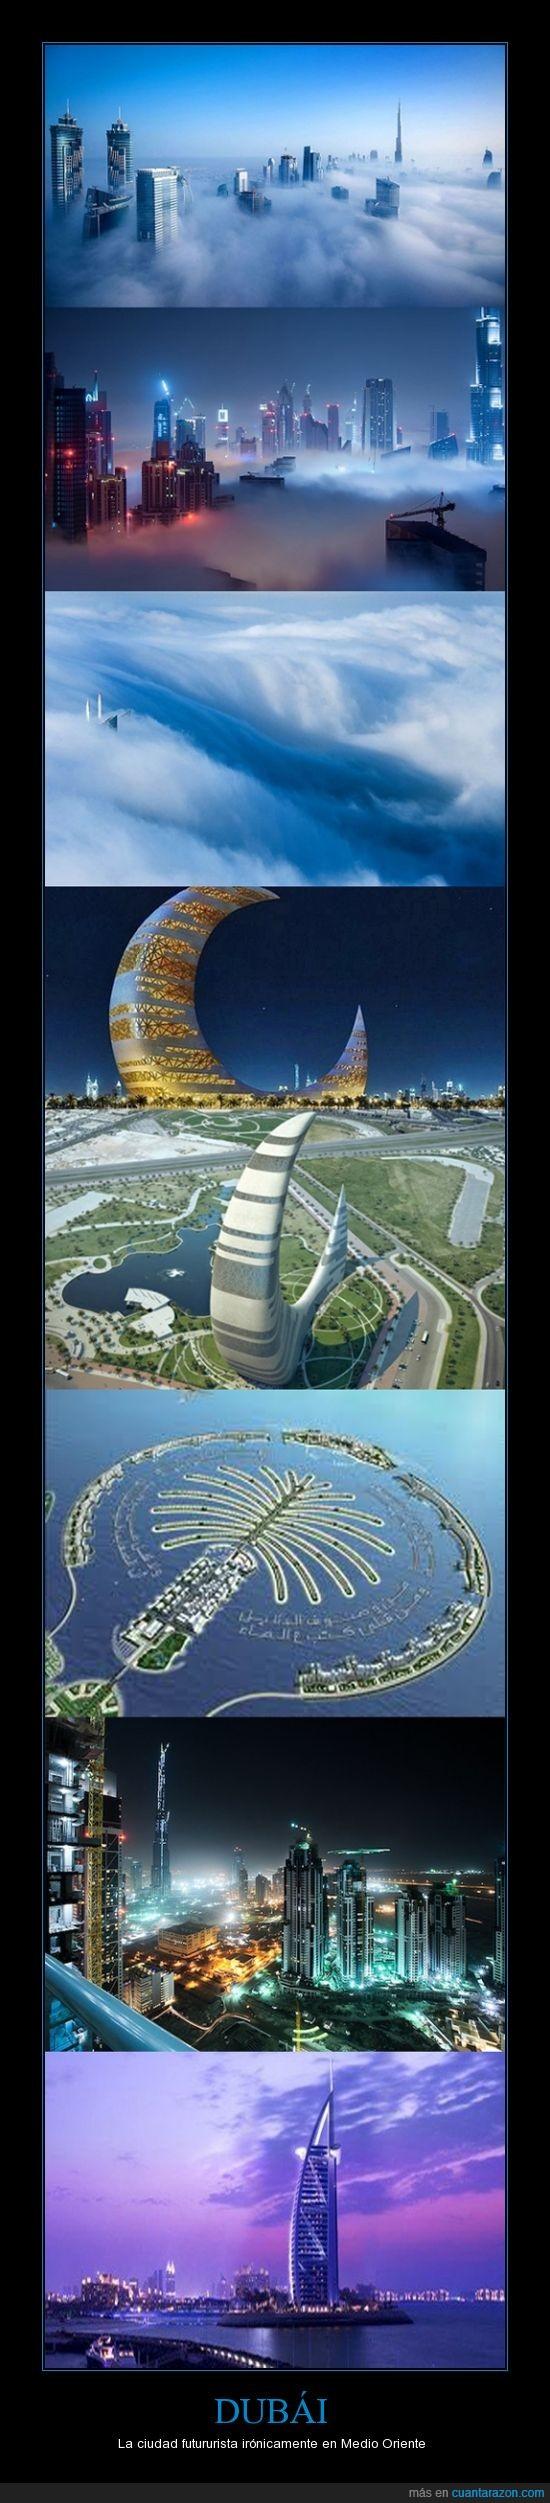 Arquitectura,Dubai,Emirato,Emiratos Arabe Unidos,Medio Oriente,Tecnología